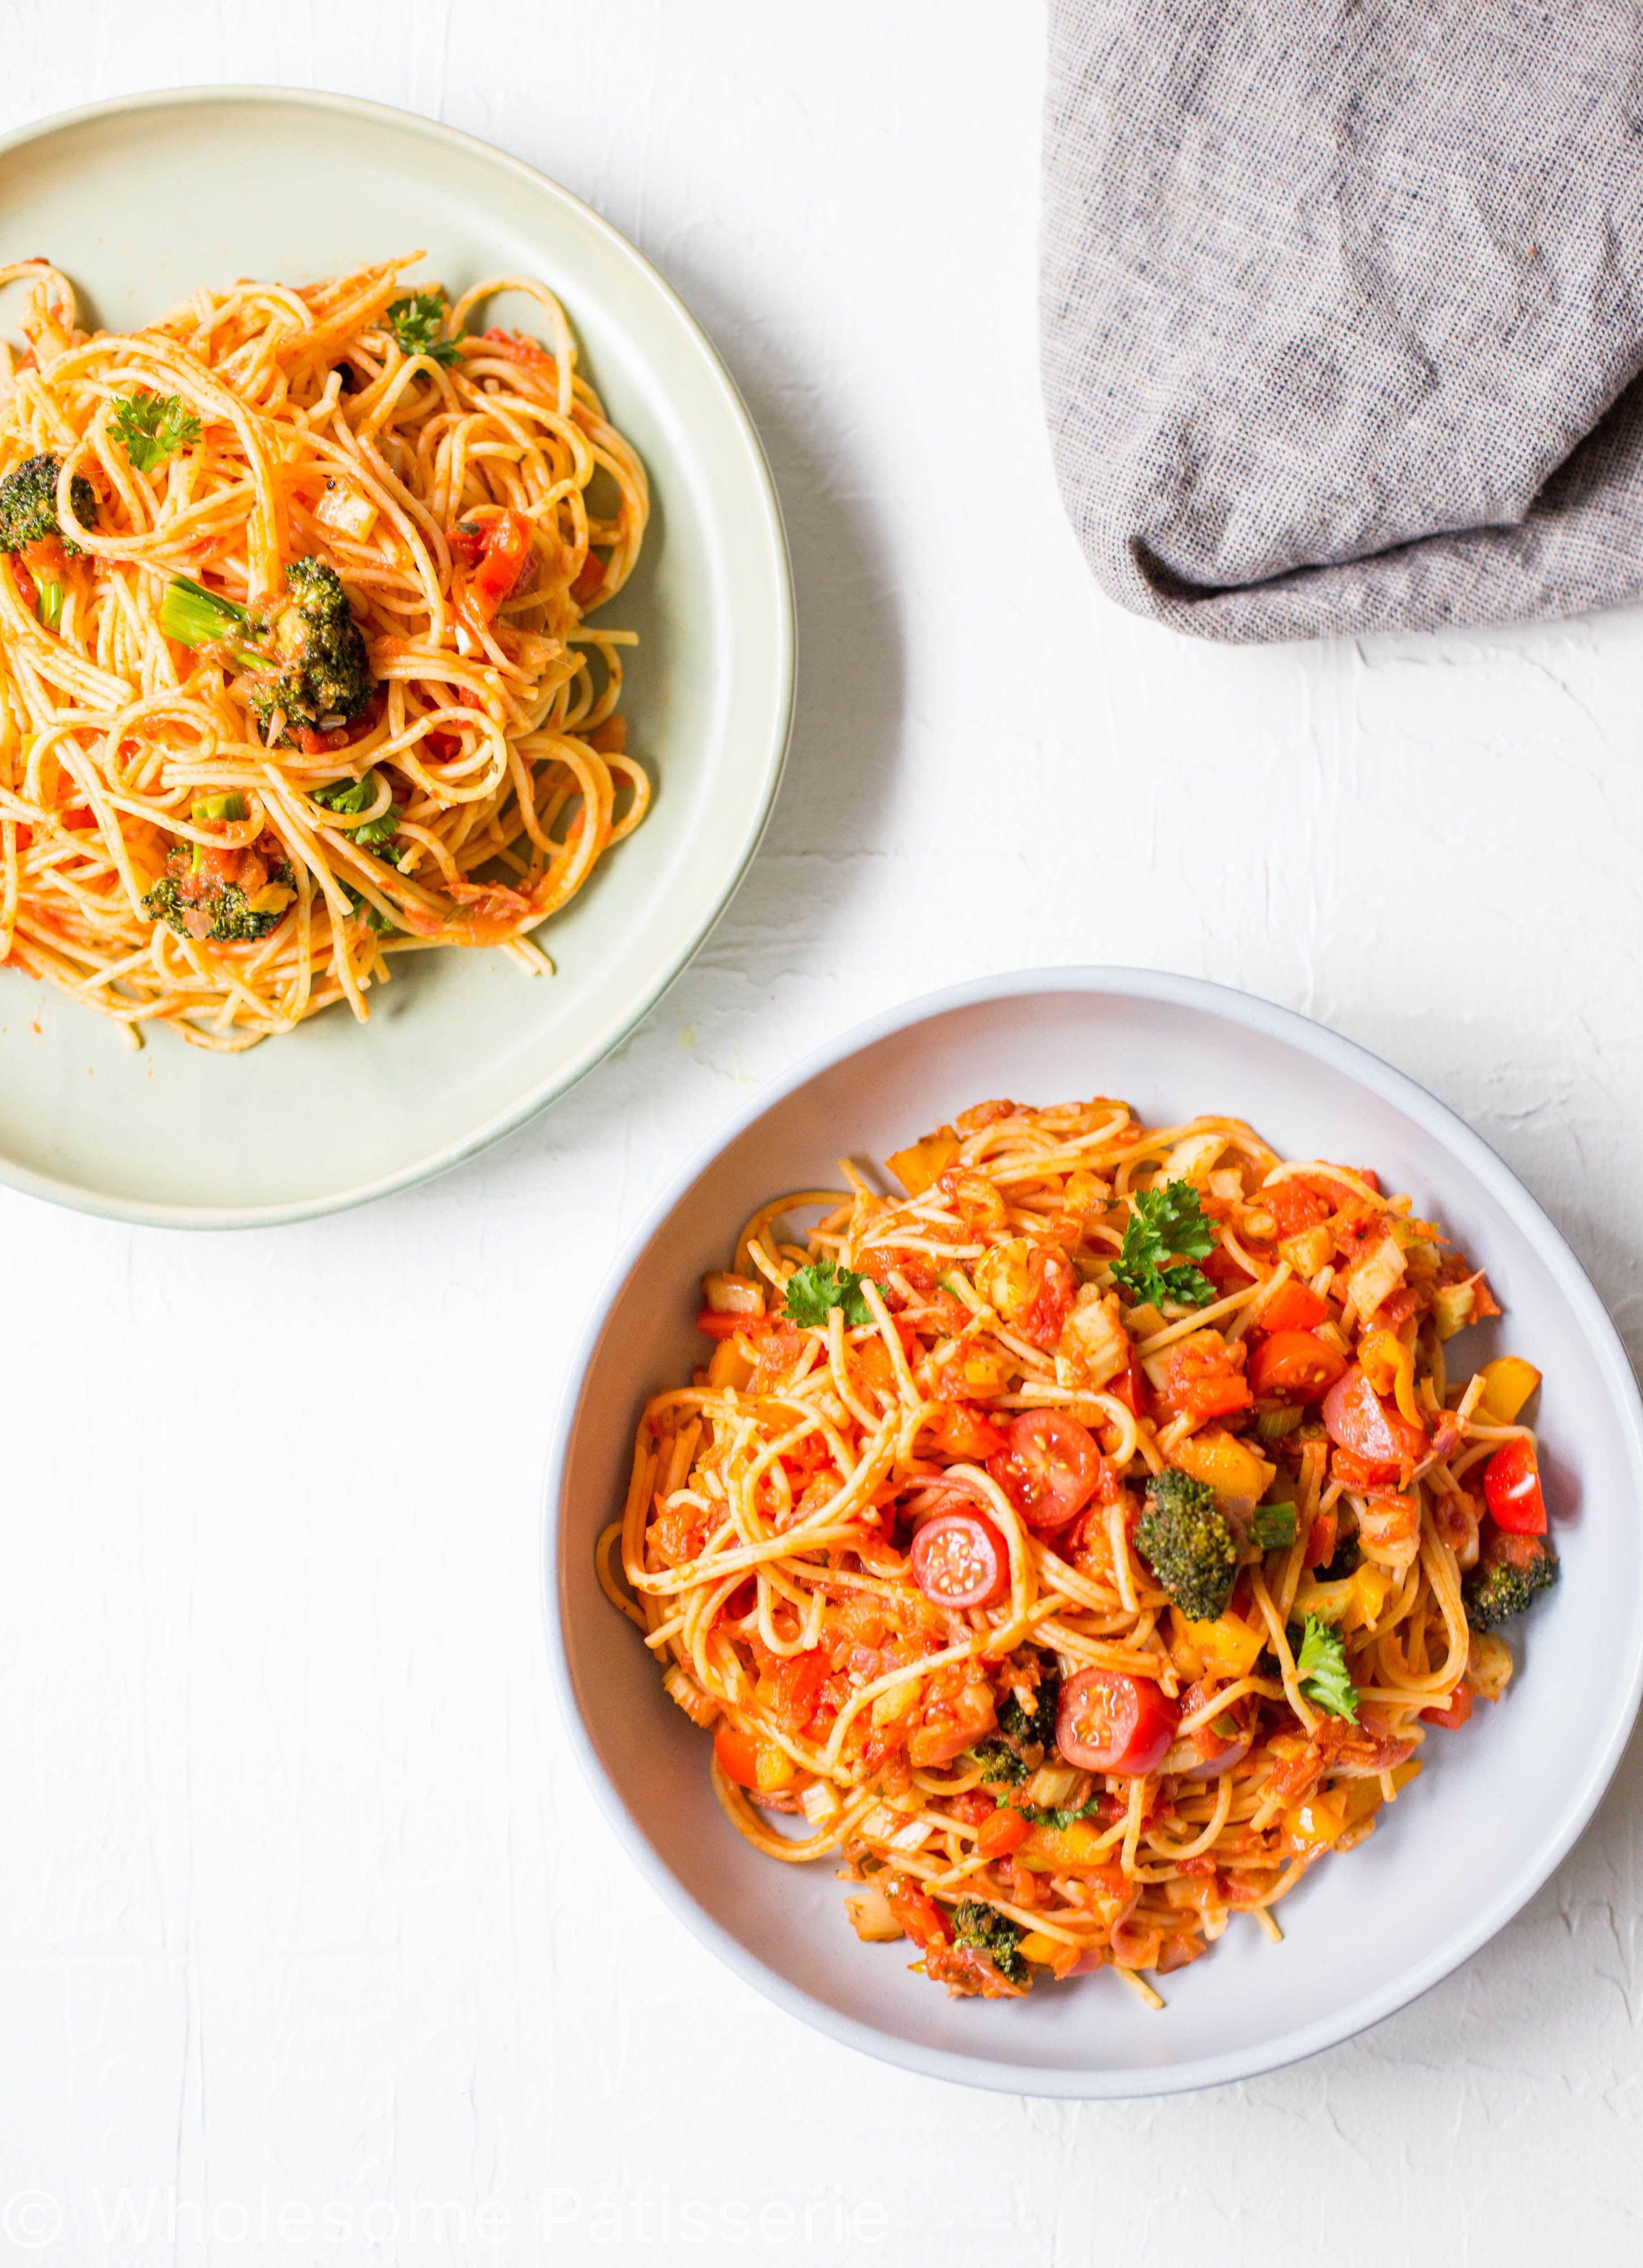 Gluten free vegetable spaghetti bowl wholesome